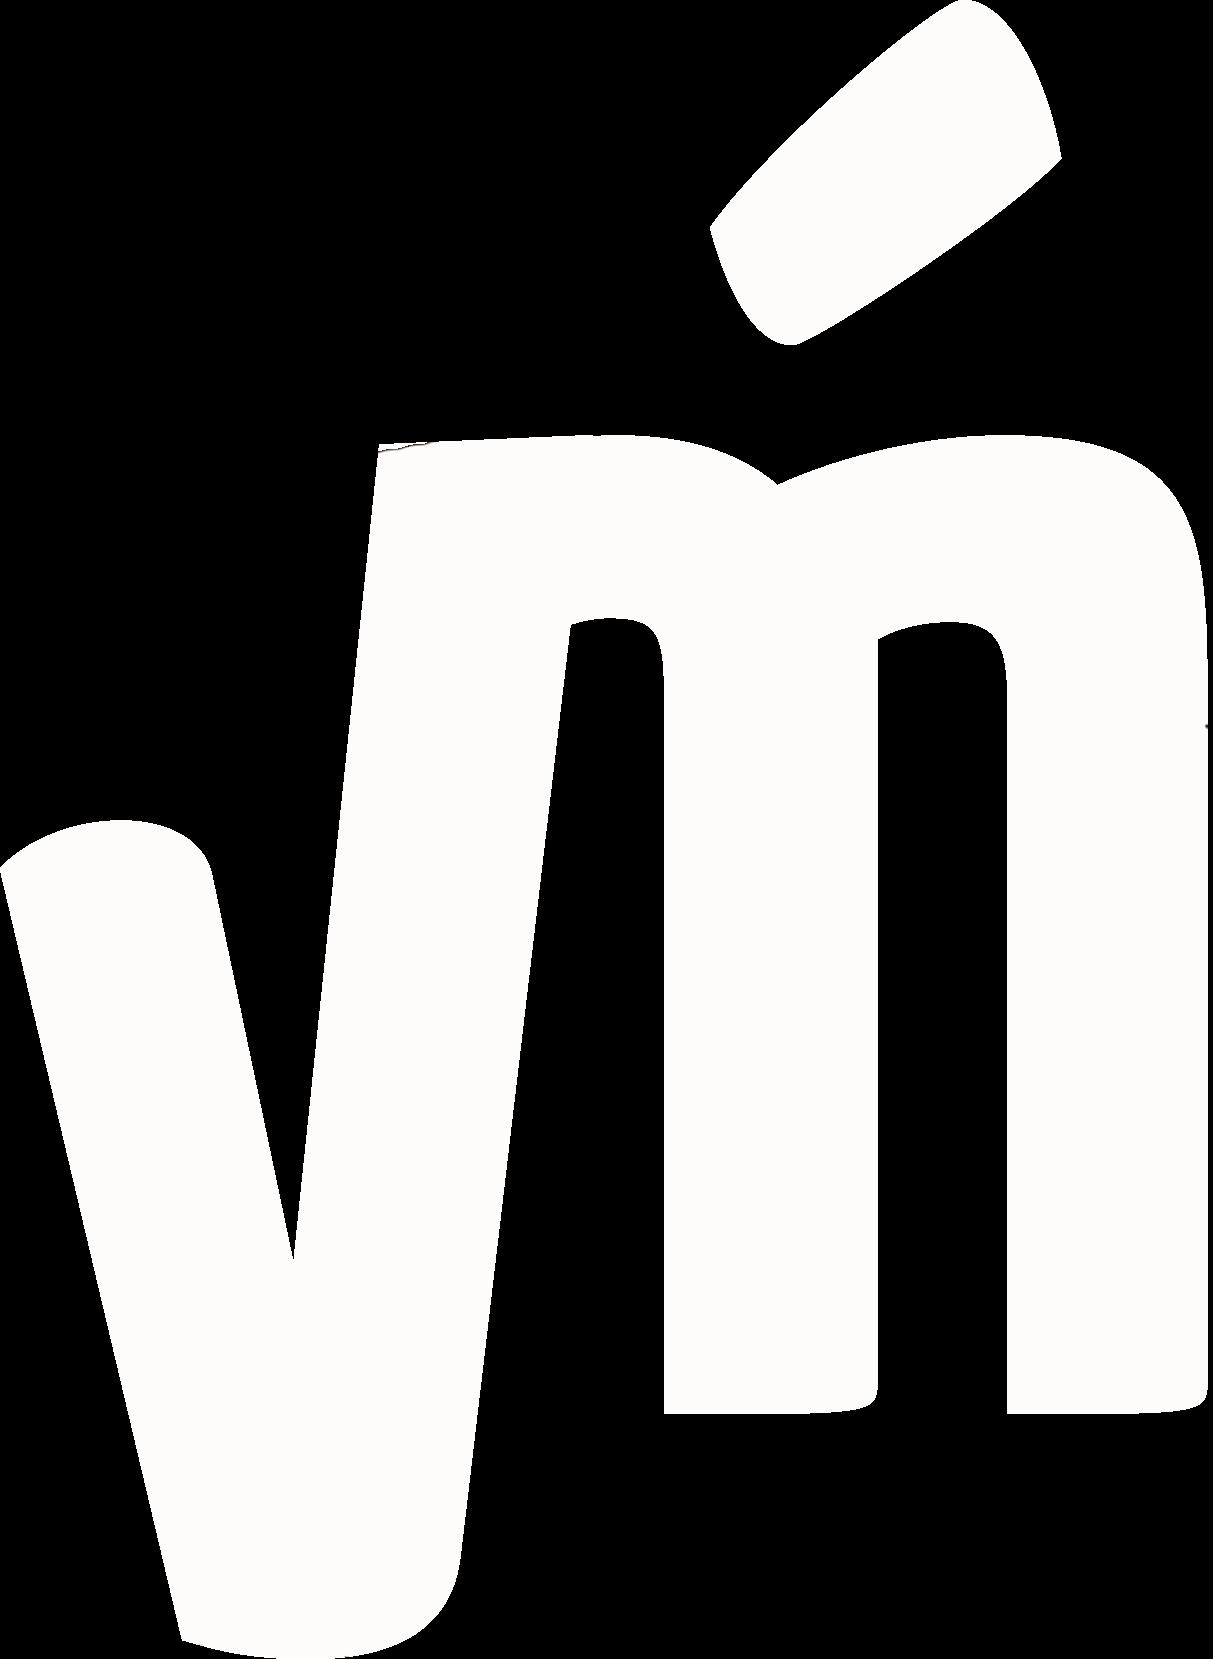 logo-varamedi blanco